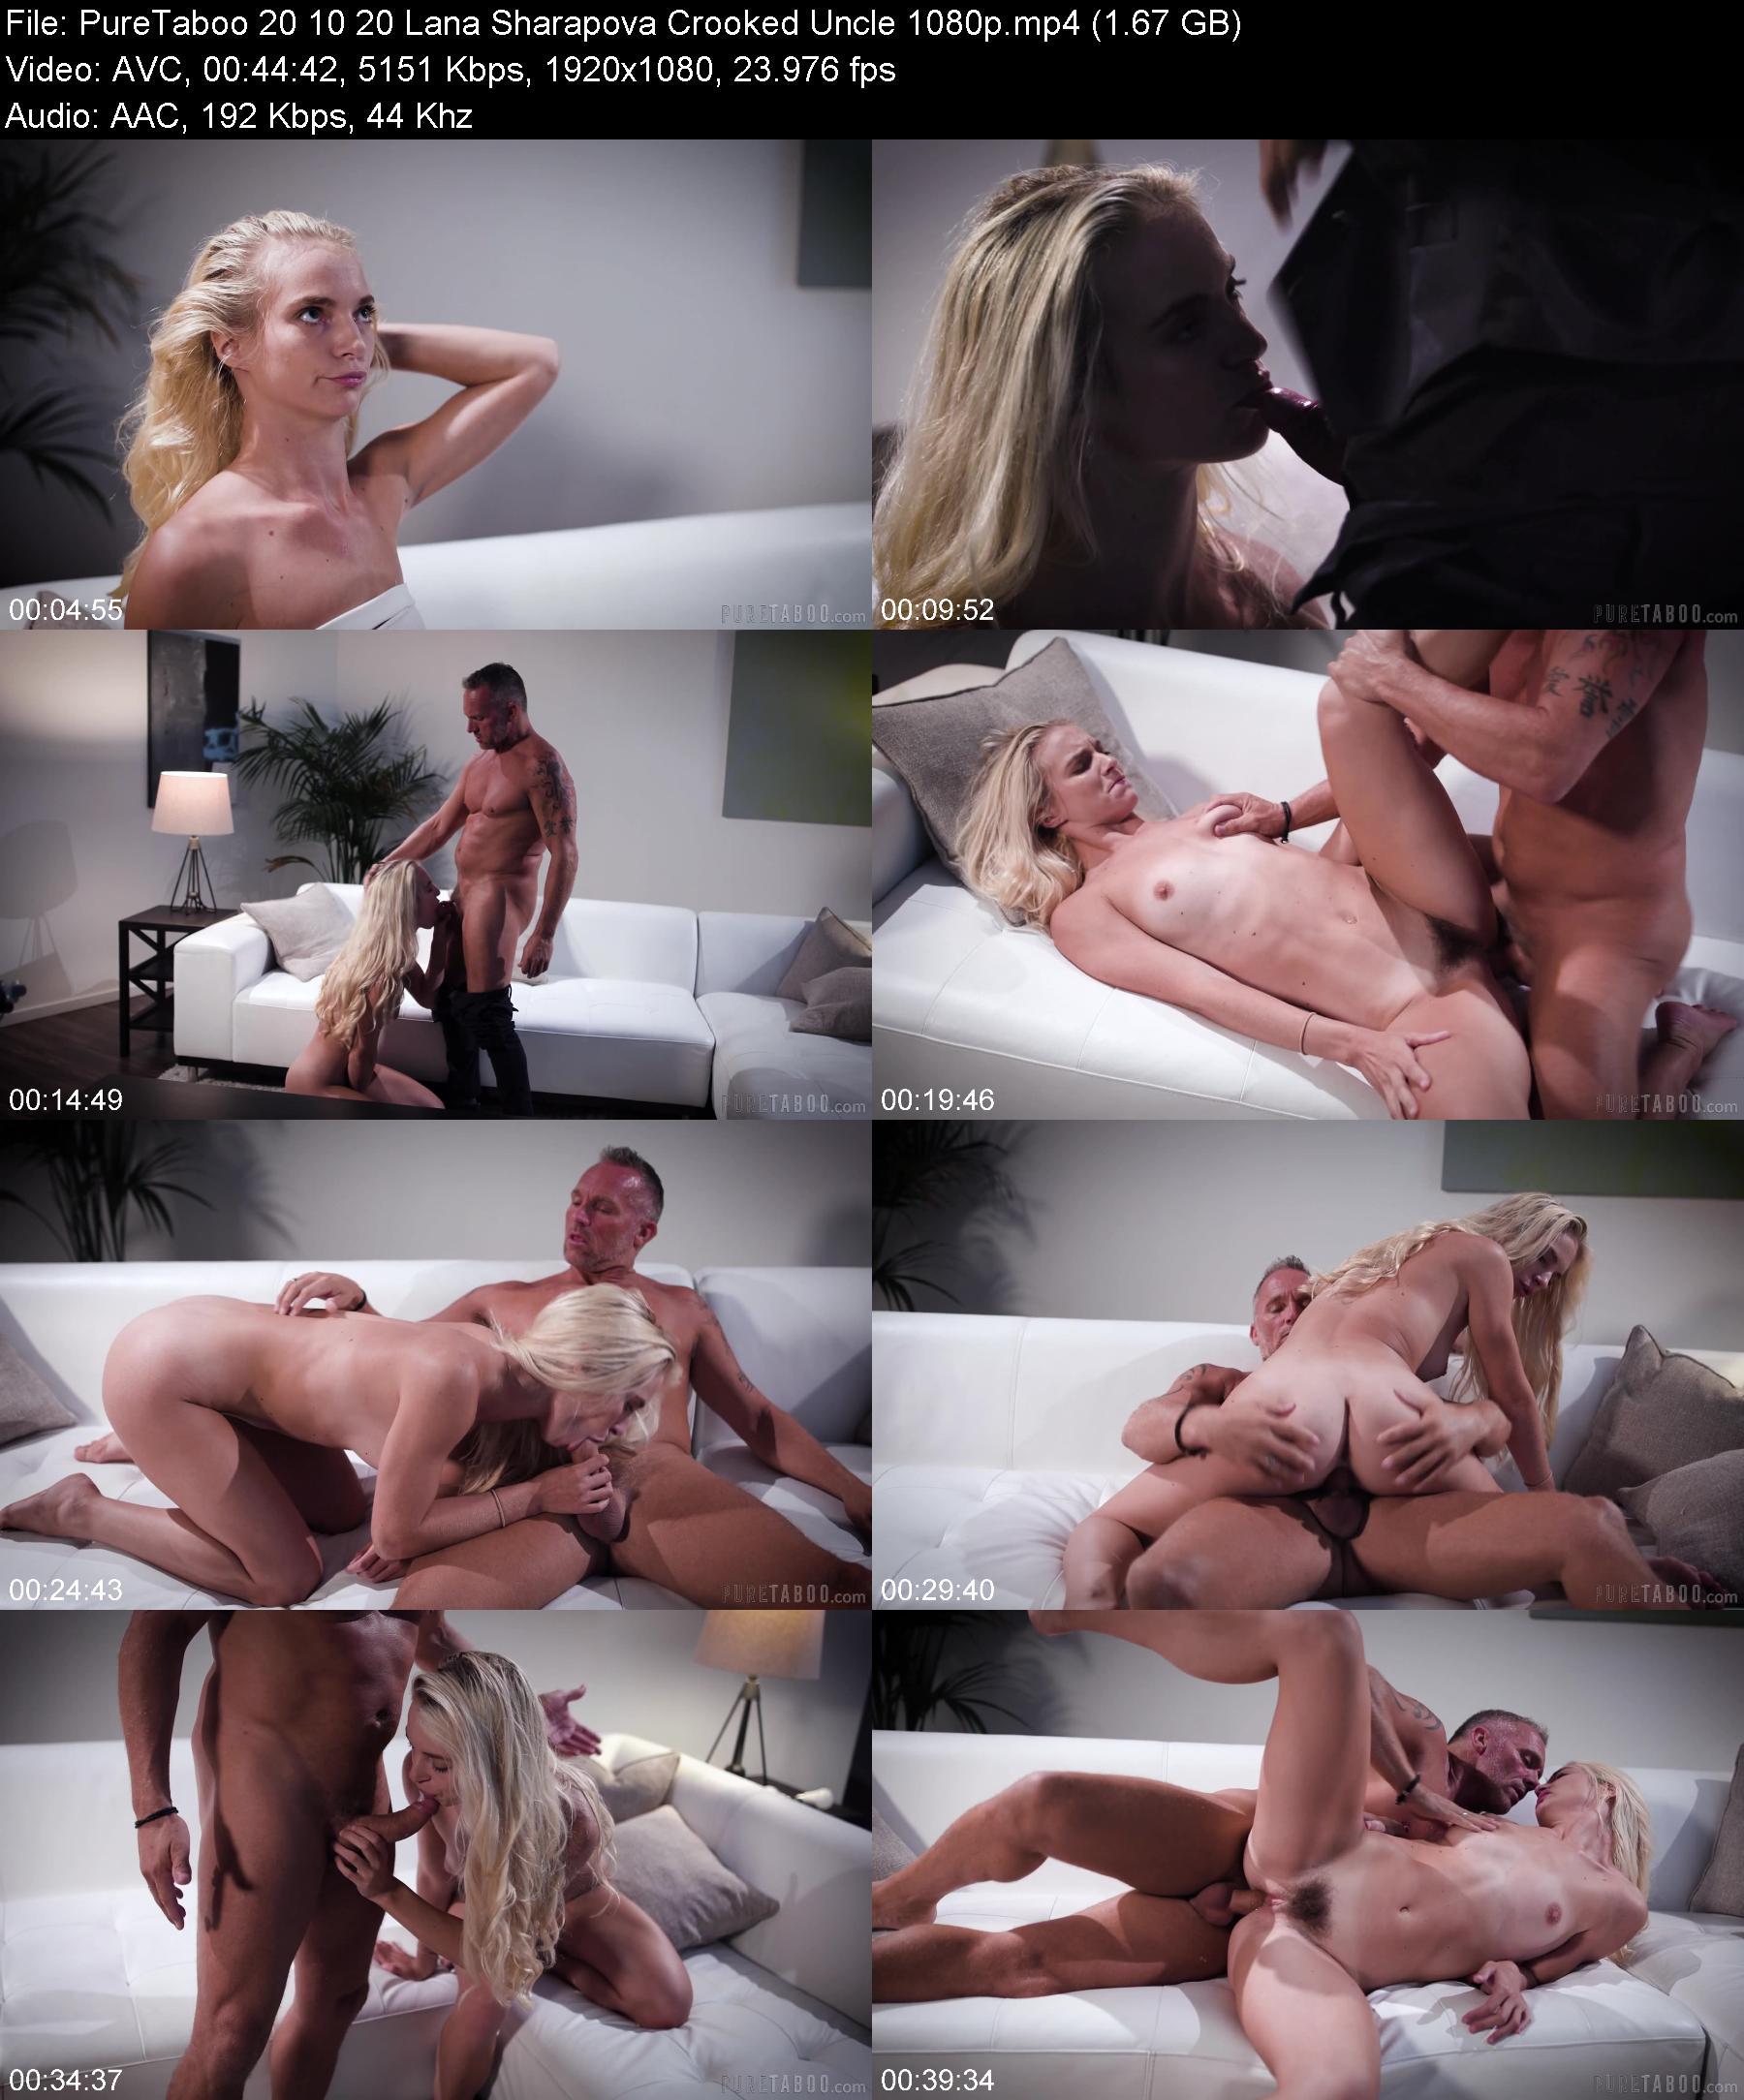 PureTaboo 20 10 20 Lana Sharapova Crooked Uncle XXX 1080p MP4-XXX